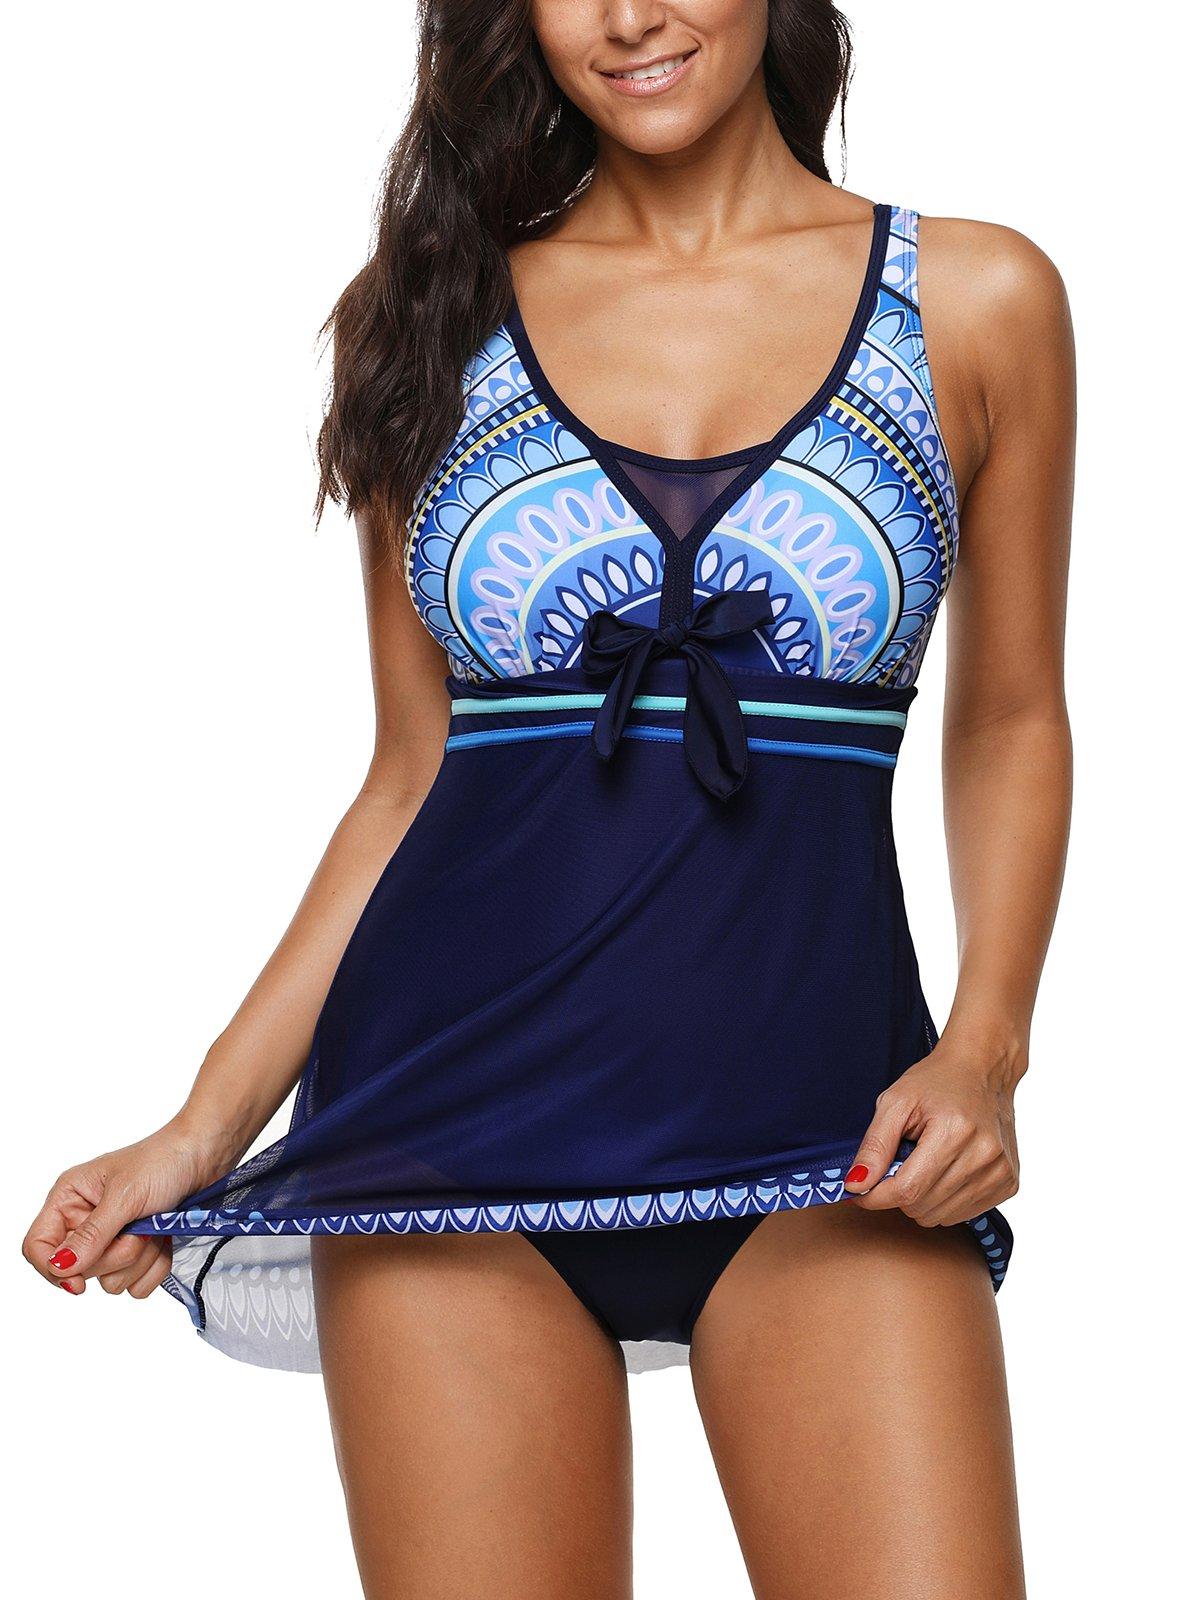 Century Star Women's One Piece Boy-Leg Bathing Suit Swimdress Printed Swimwear Swimsuits Blue S(US 2-4)